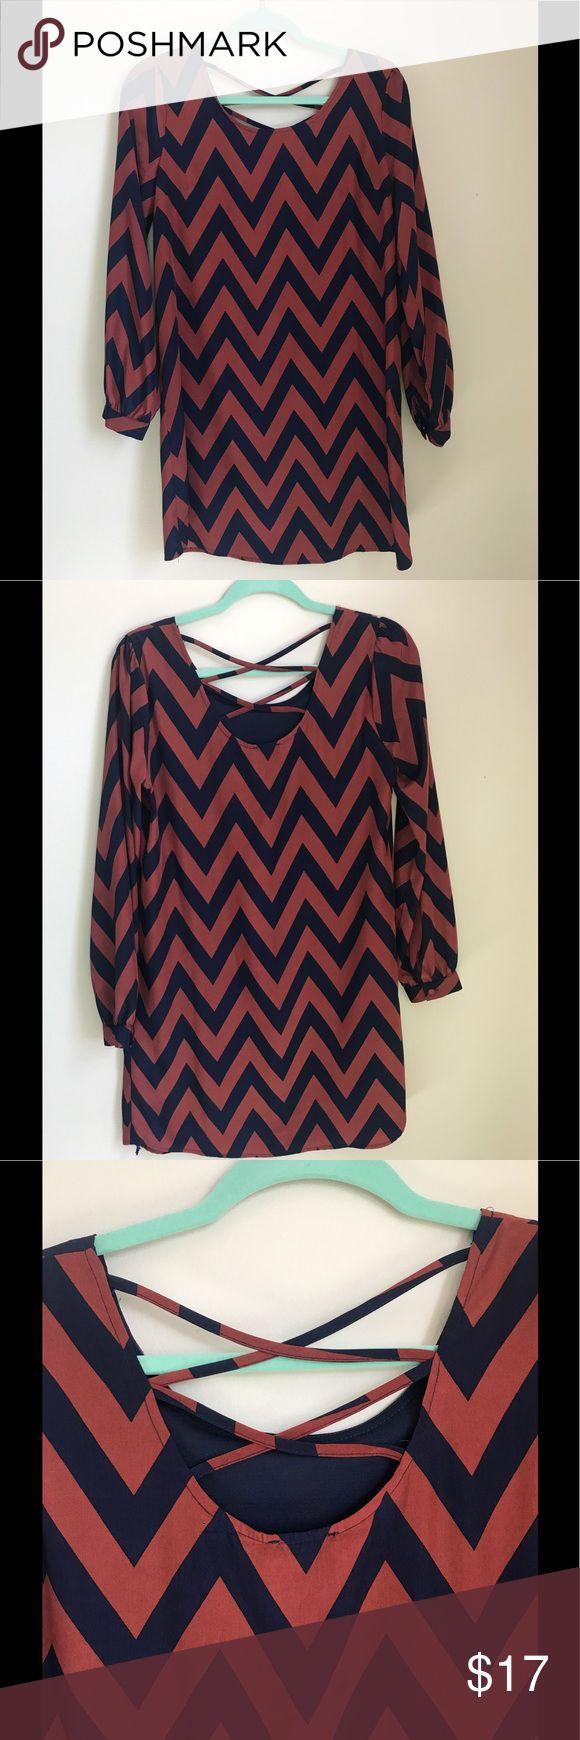 Blue and orange chevron dress Chevron patterned long sleeved dress. Charming Charlie Dresses Long Sleeve